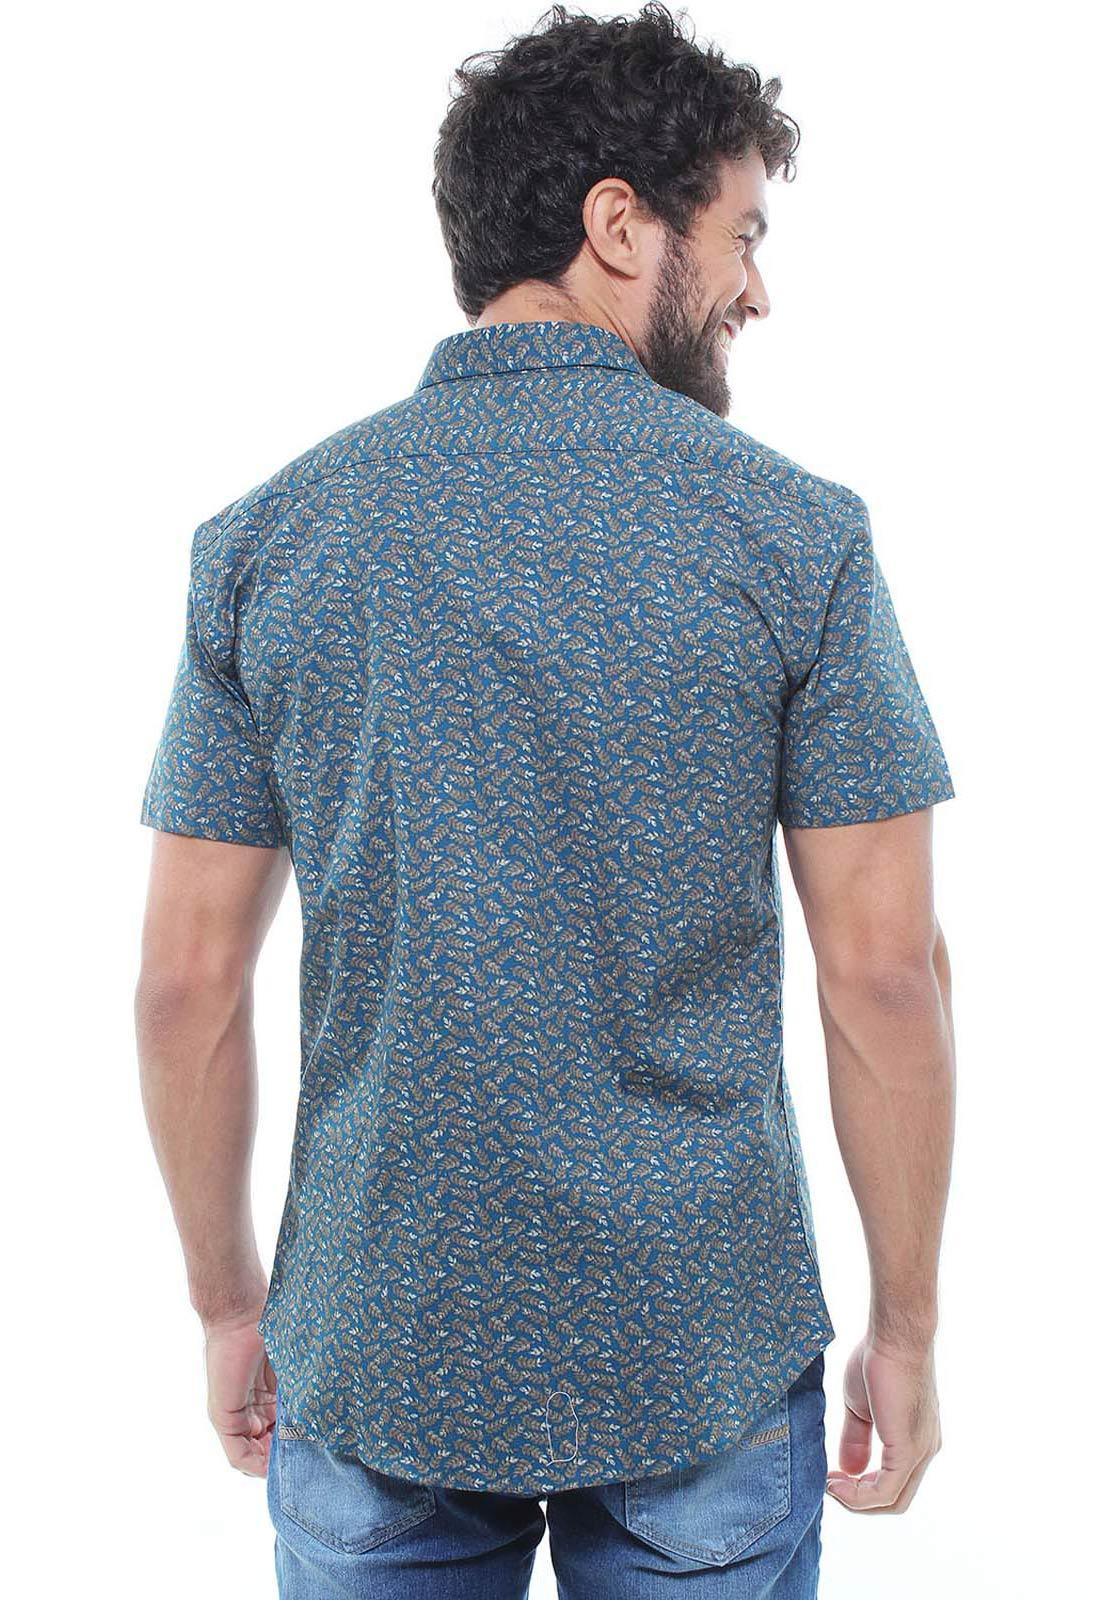 Camisa Estampada Masculina Manga Curta Crocker - 47930  - CROCKER JEANS